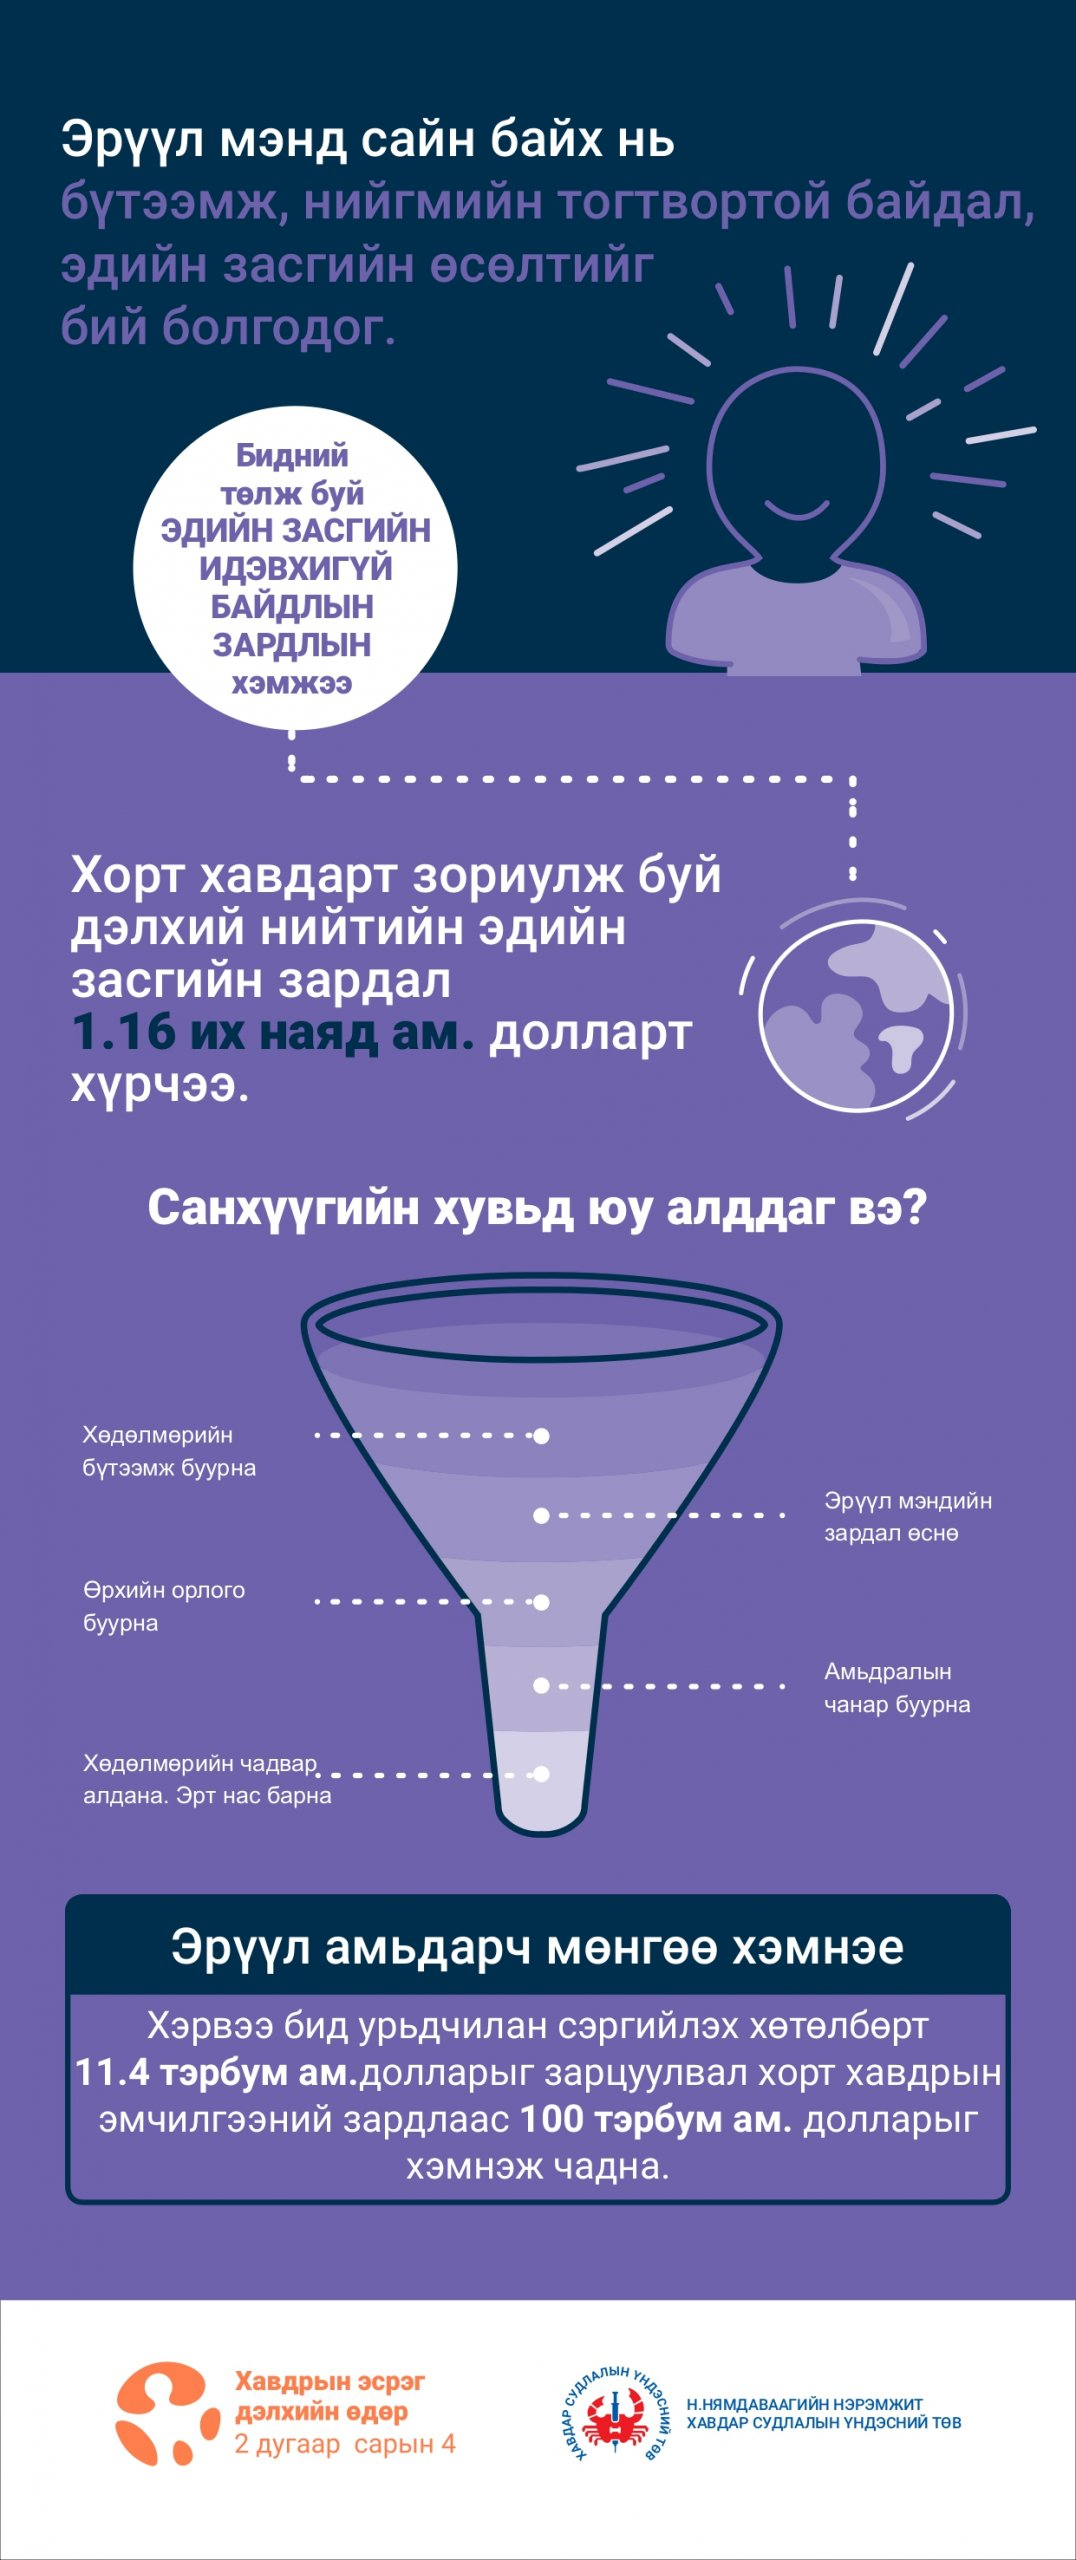 info 1 world cancer day